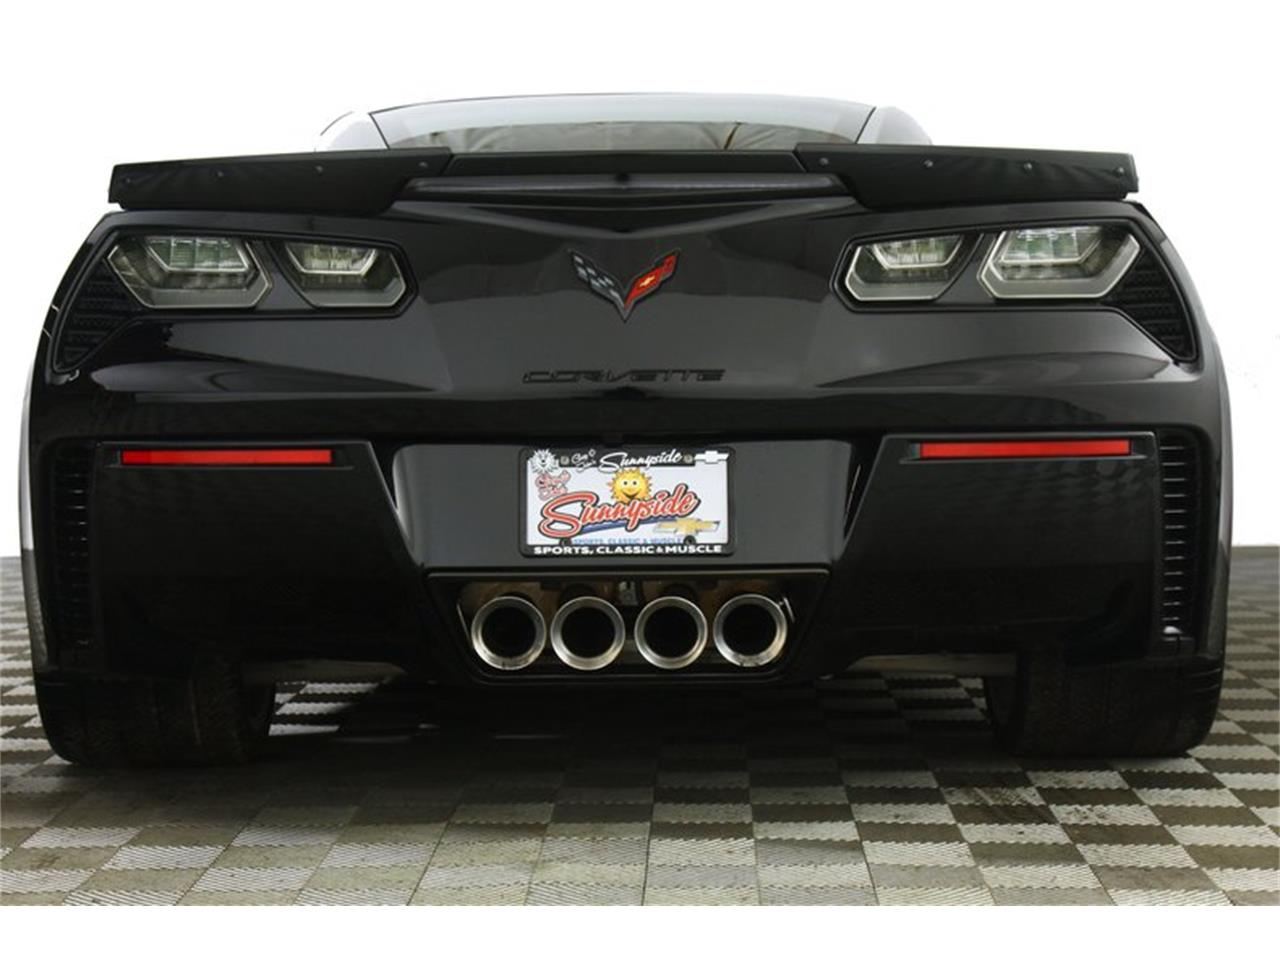 2015 Chevrolet Corvette (CC-1420876) for sale in Elyria, Ohio